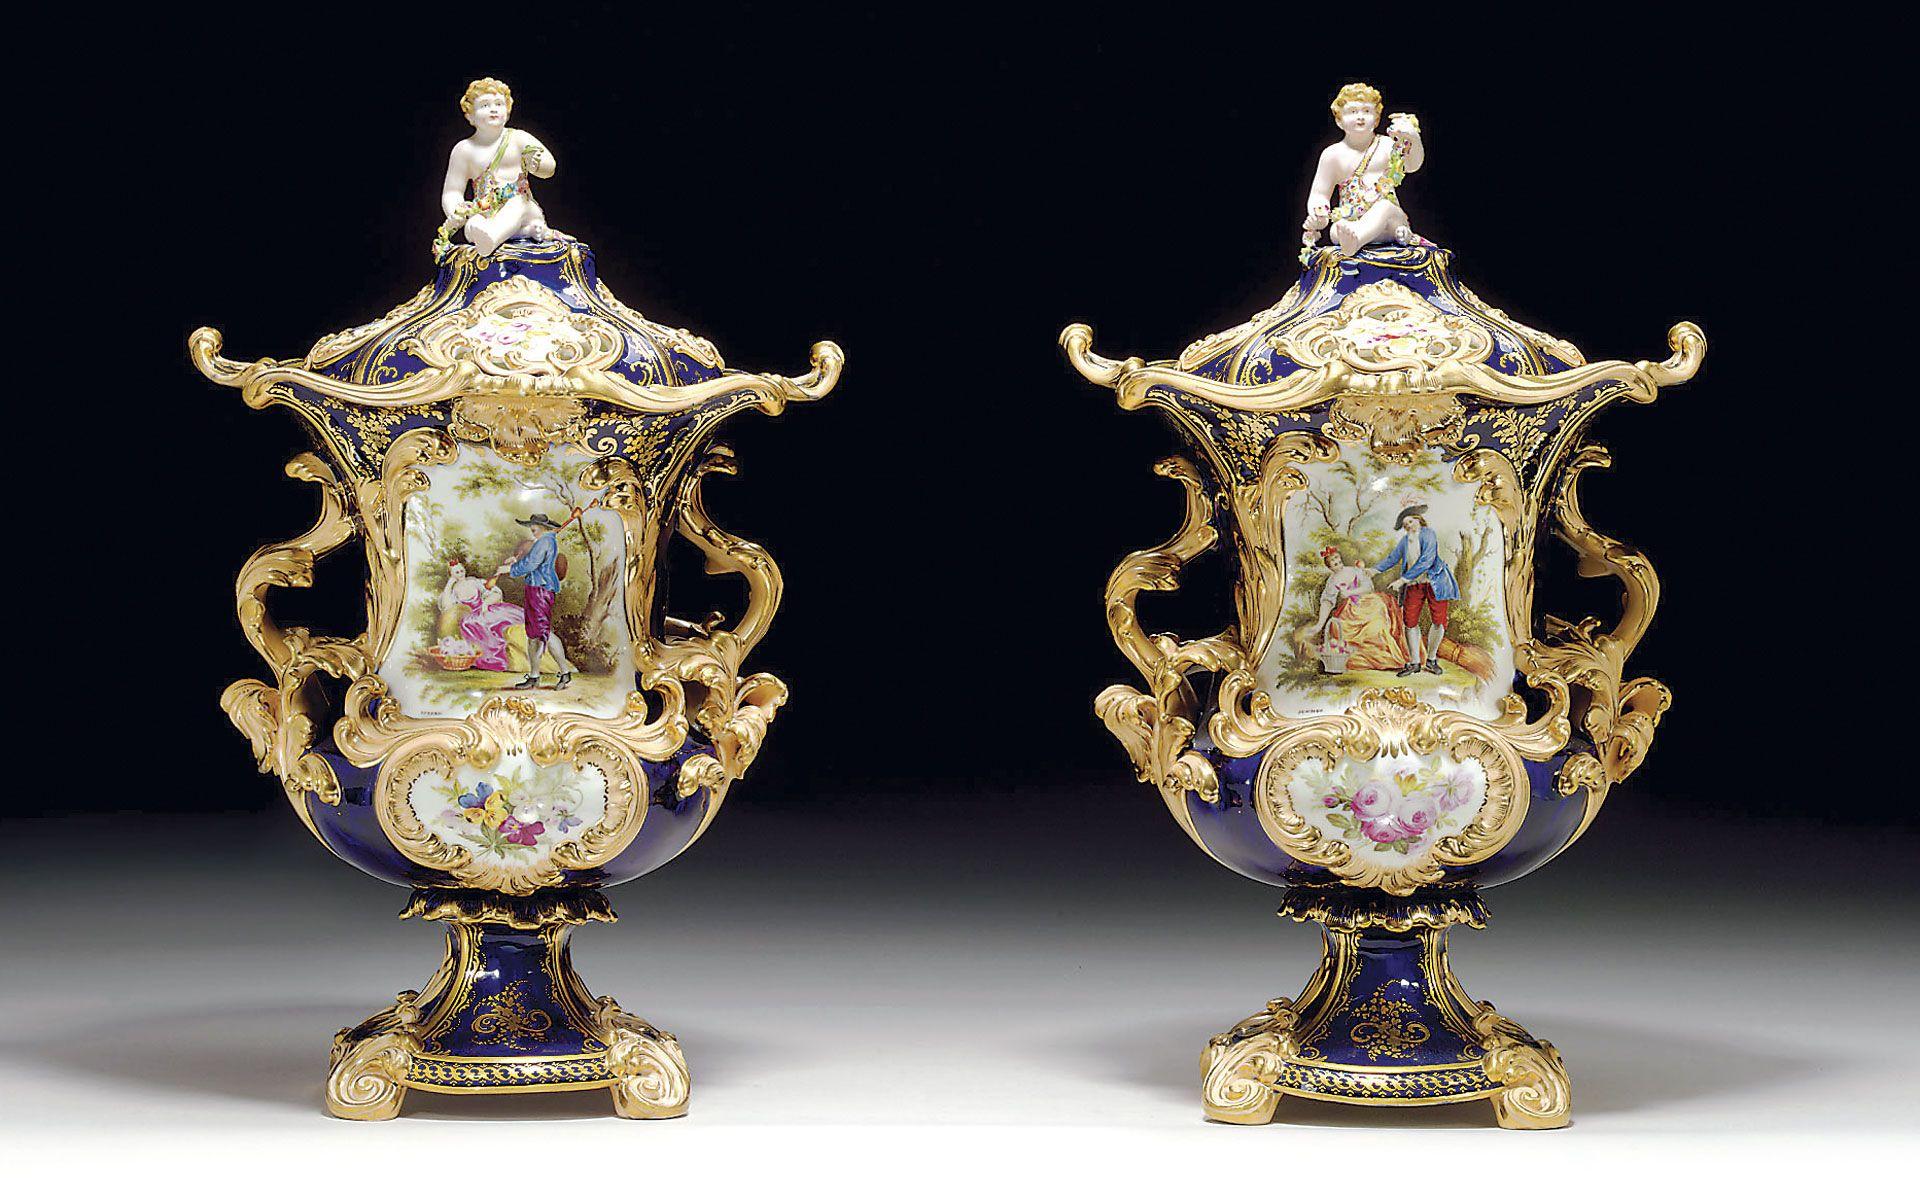 Thomas Minton Pair of Cobalt Blue Ground Potpourri Vases & Covers, cir. 1838